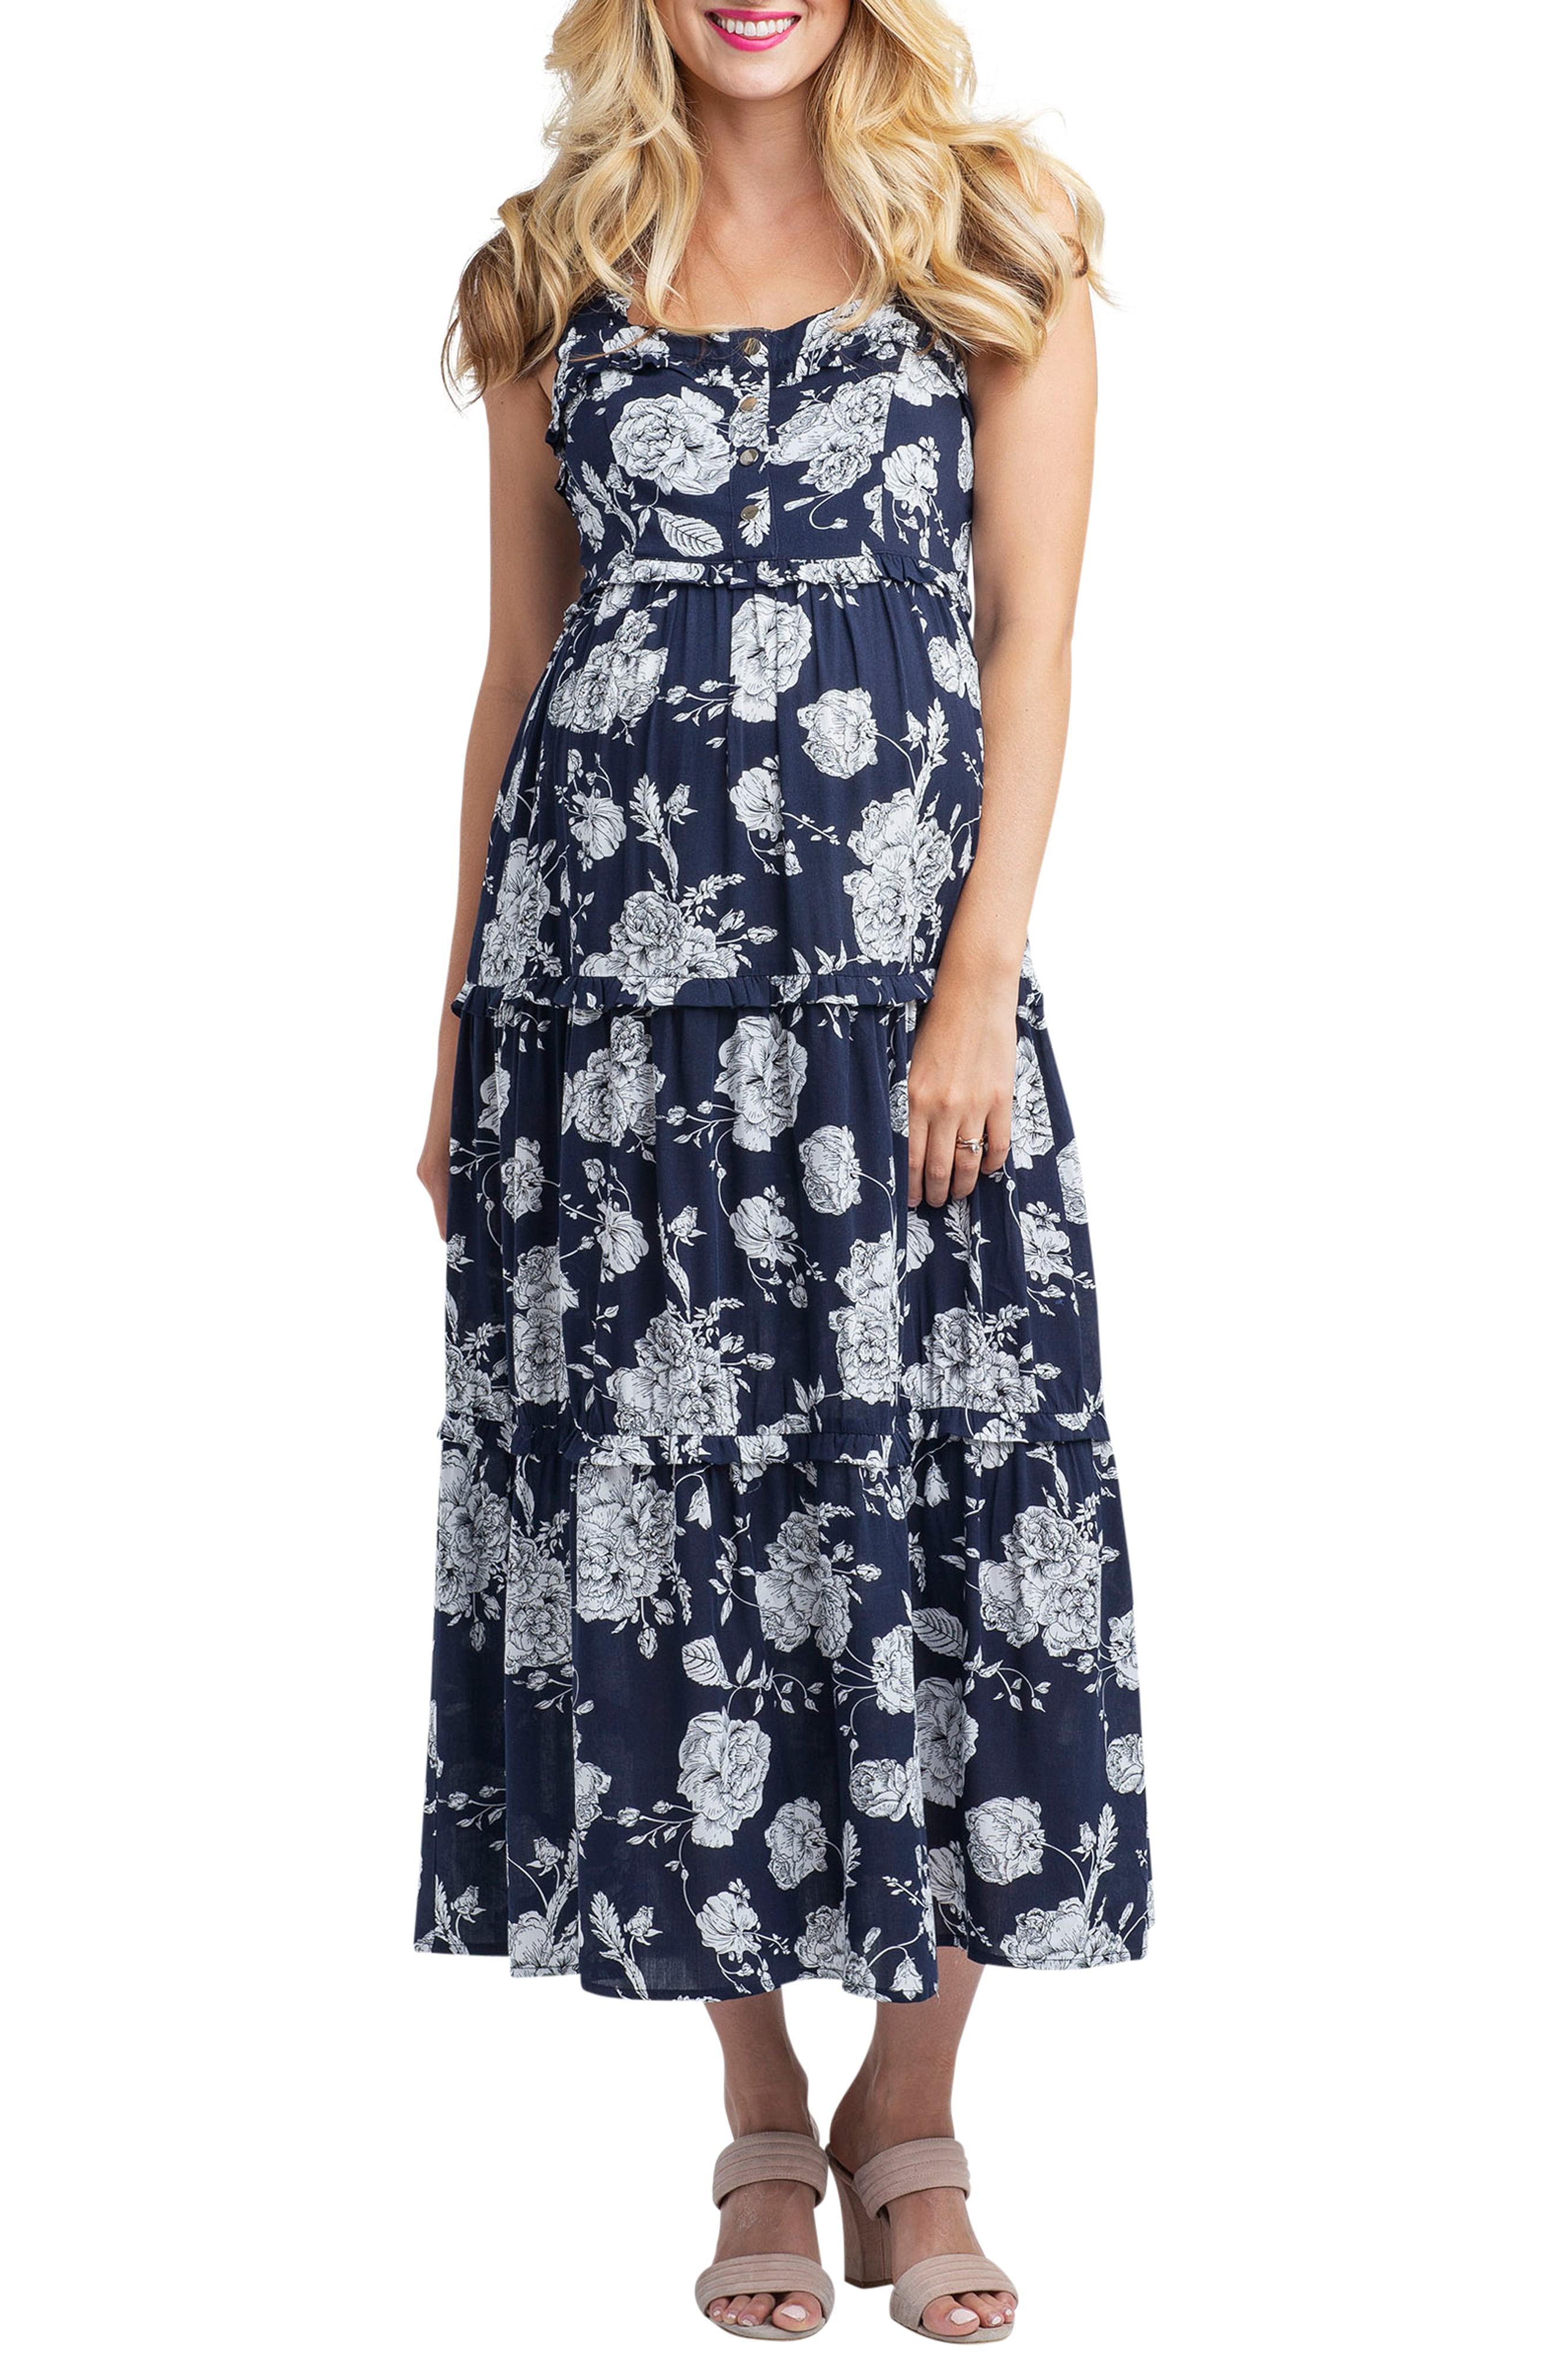 5199b61c104ee Lyst - Nom Maternity Emma Maternity/nursing Midi Dress in Blue